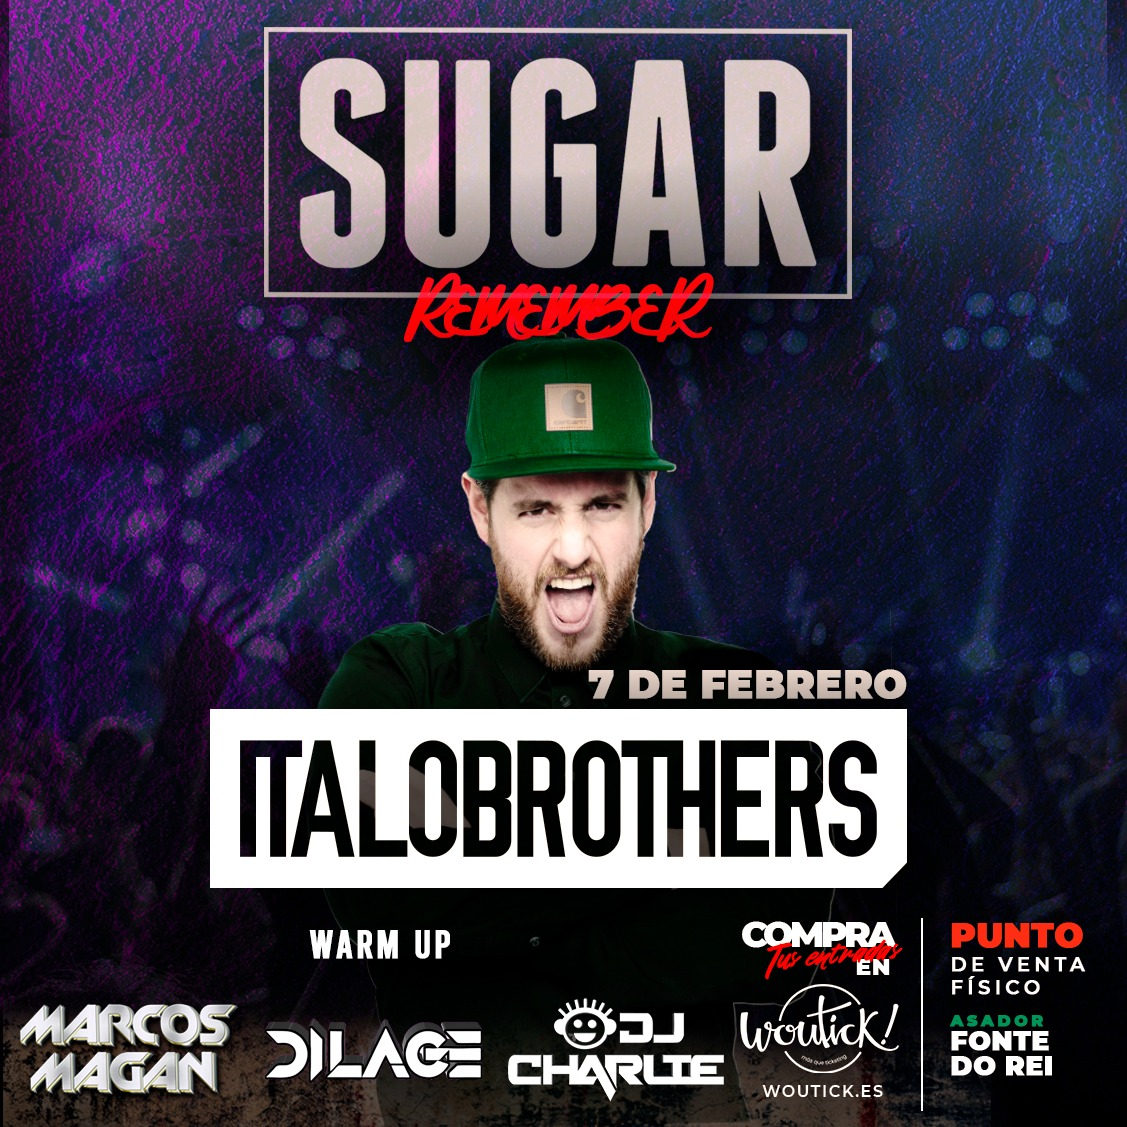 07-02-2020-Sugar-Lugo-CUADRADO